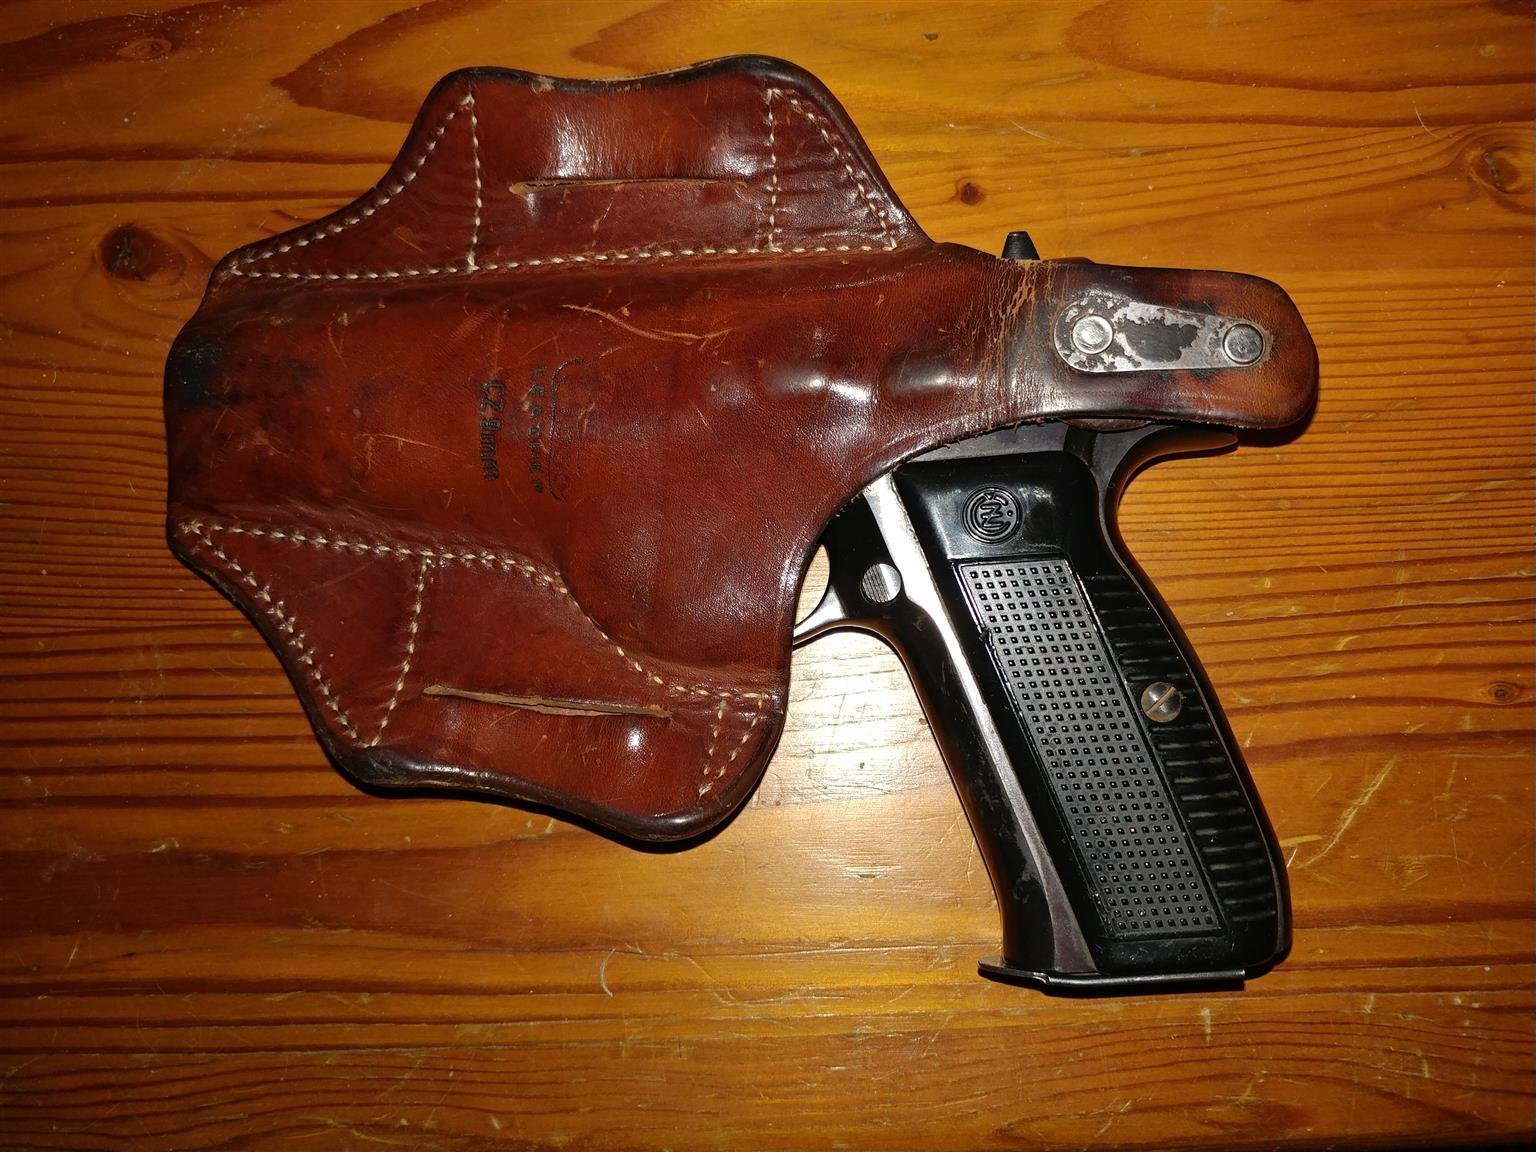 CZ 75 9mm pistol